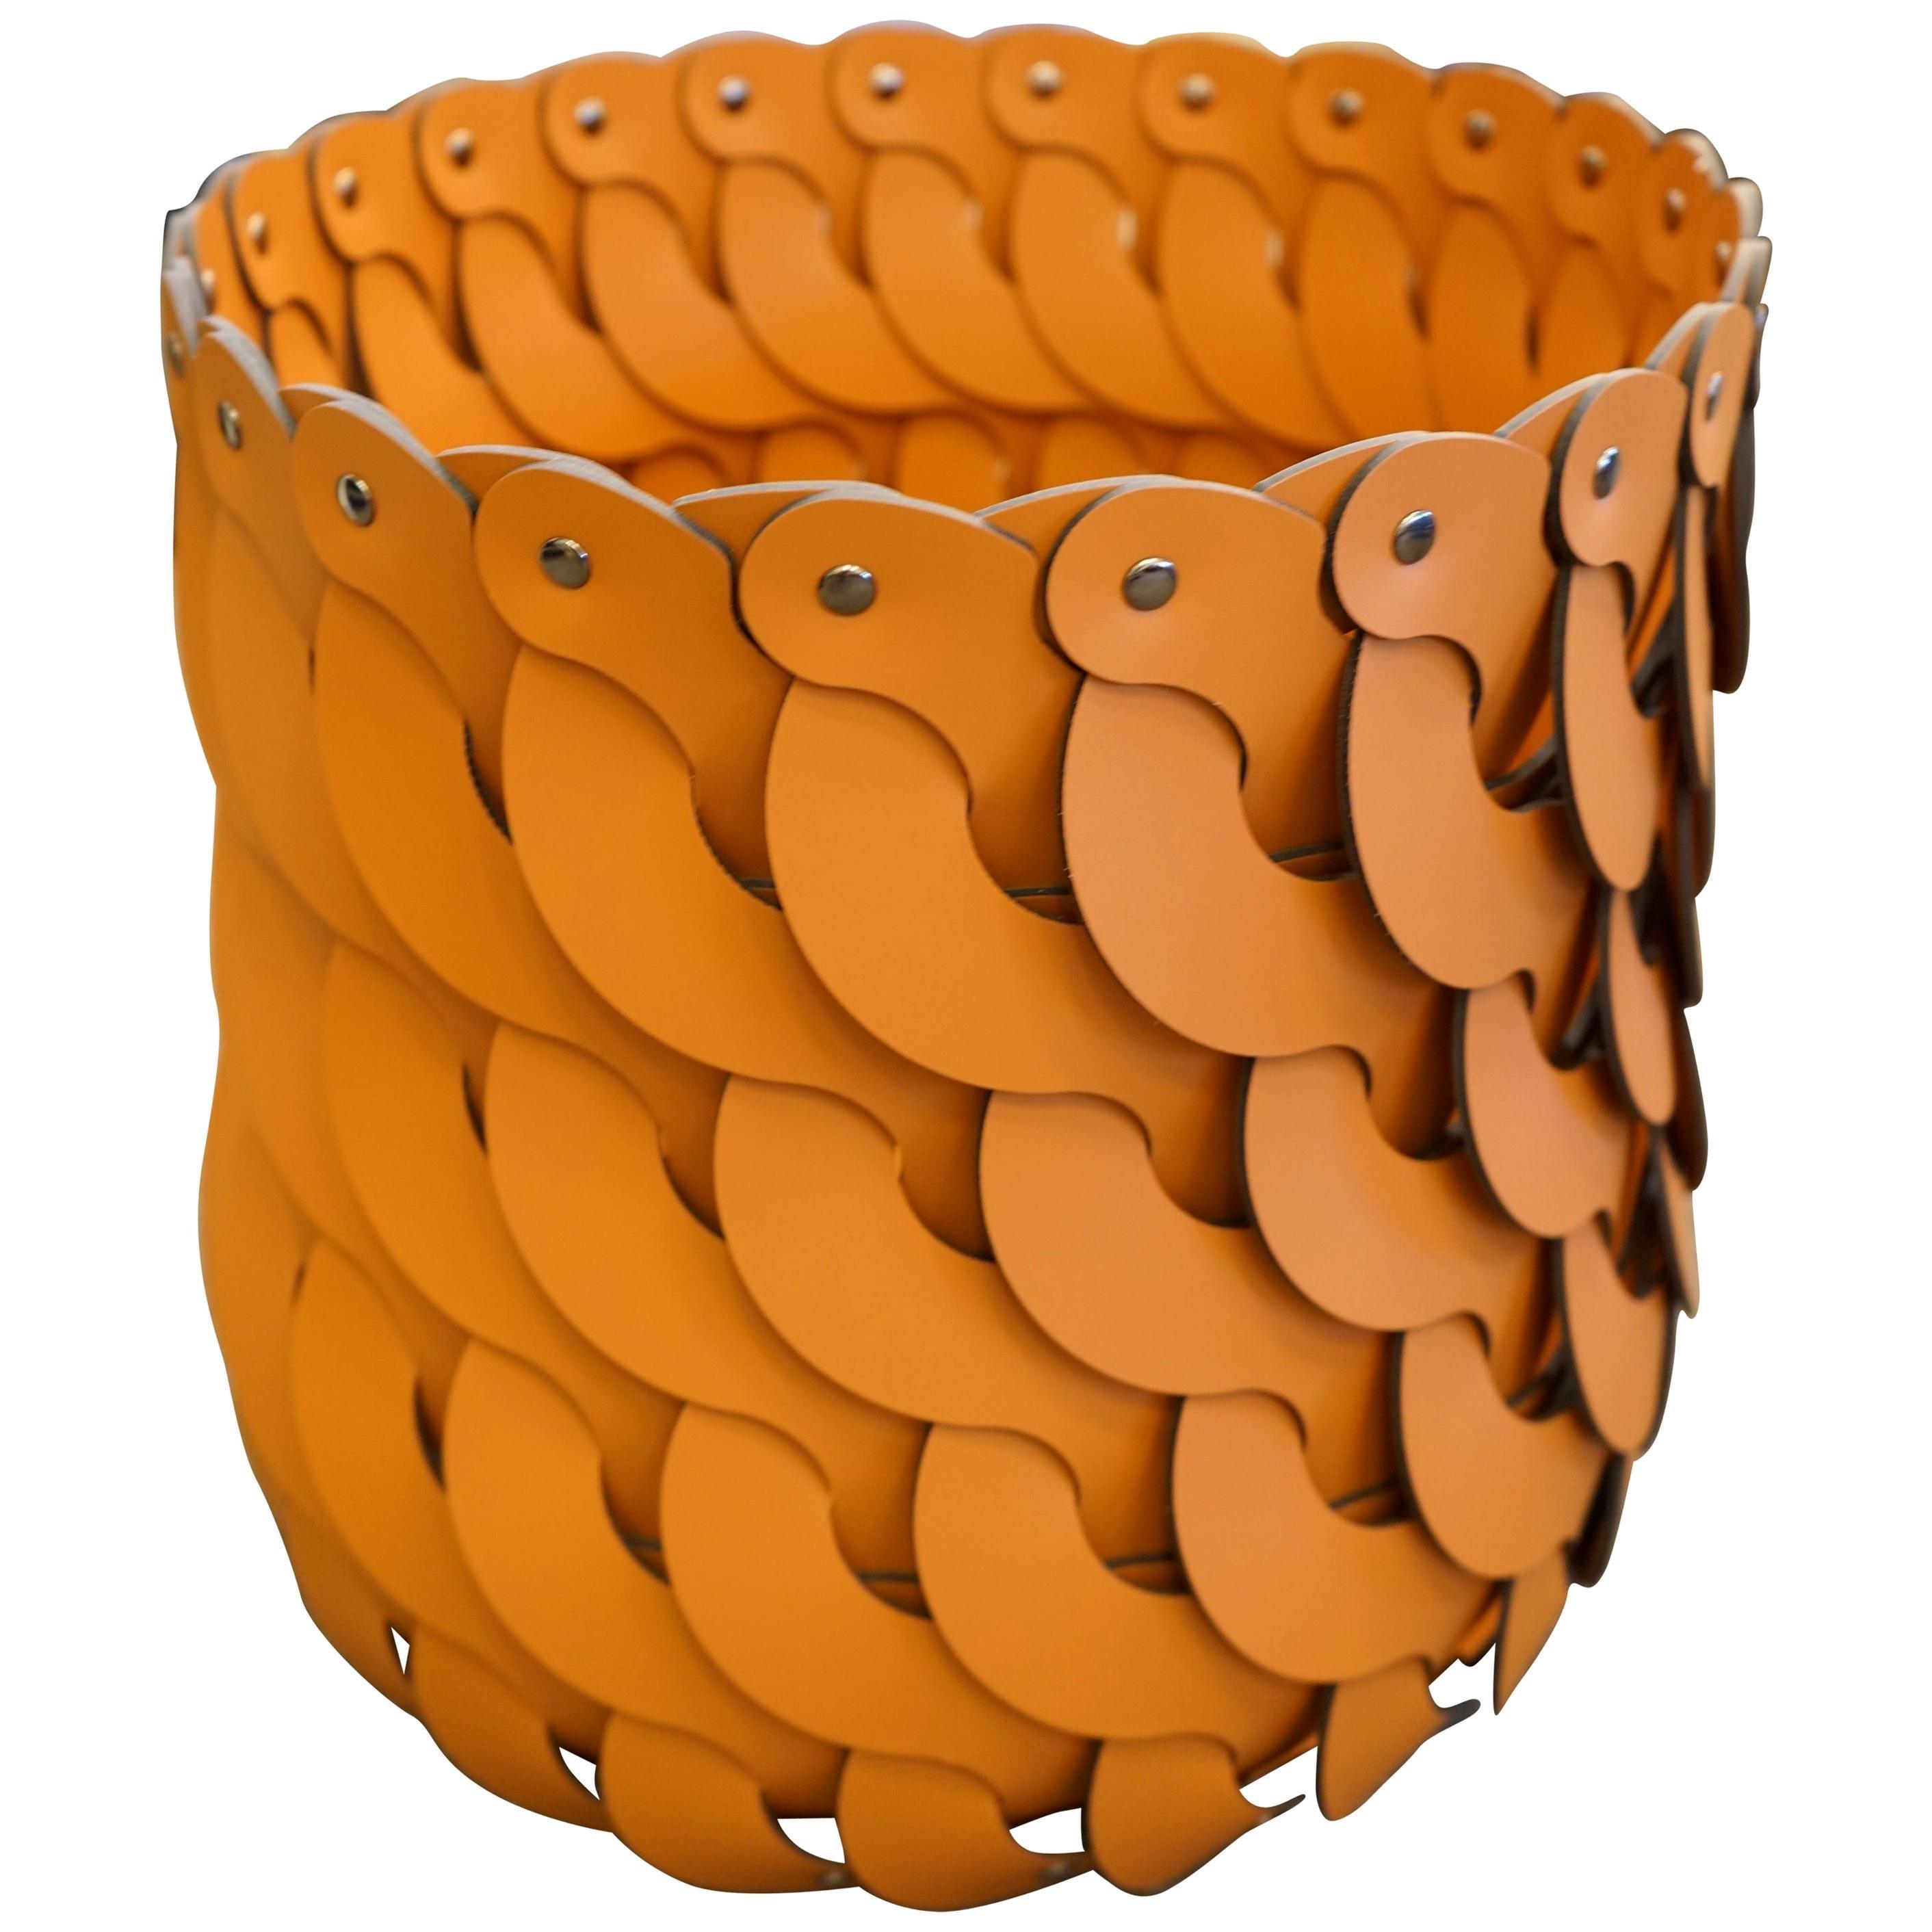 Contemporary Tan Woven Leather Alicante Tall Basket